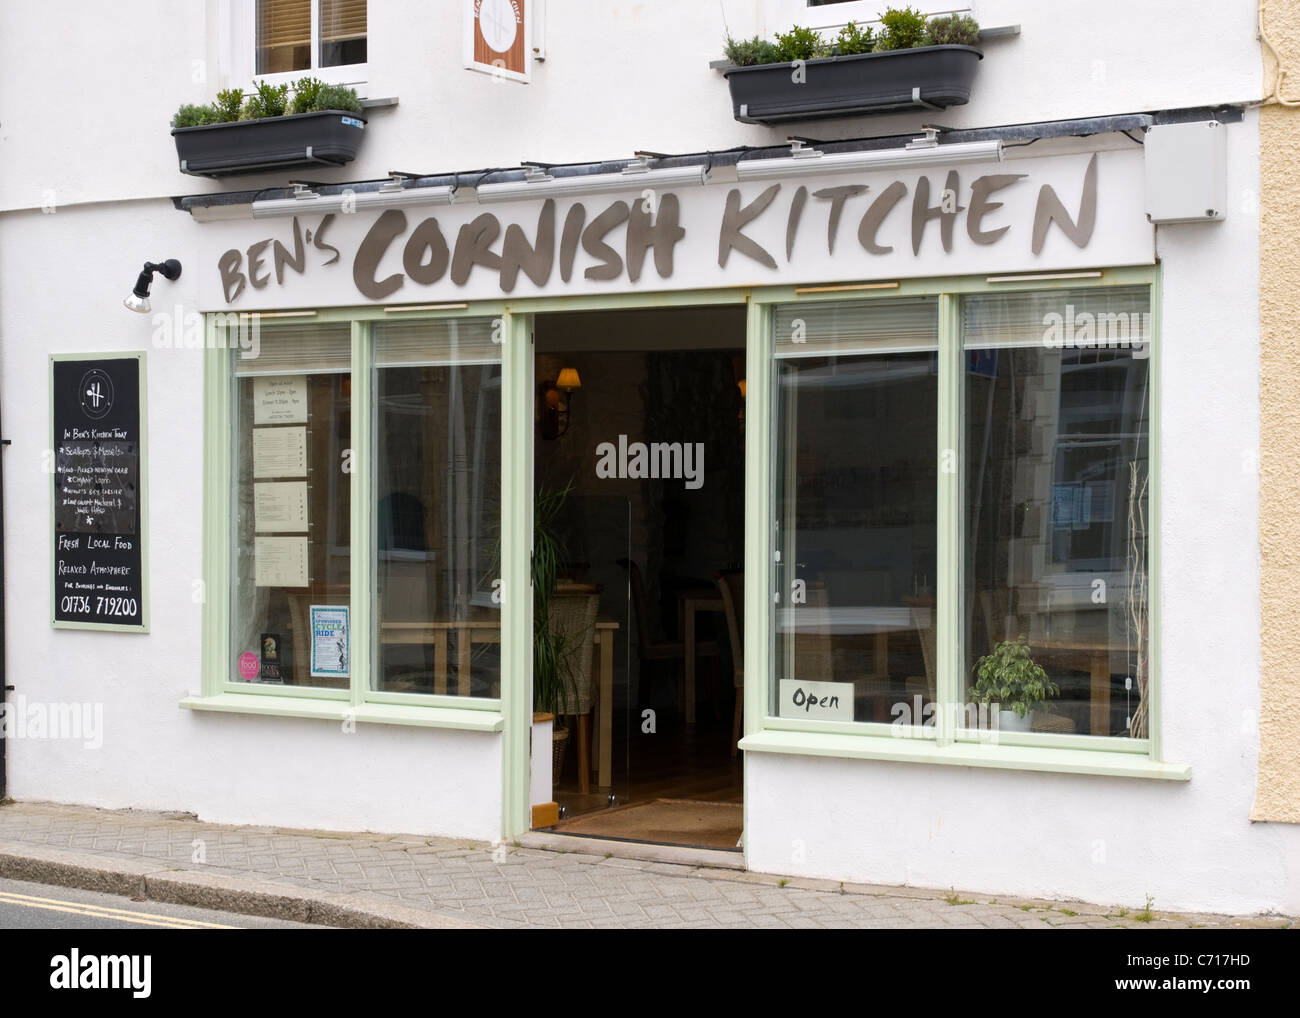 Ben S Cornish Kitchen Cafe Marazion Stock Photo Alamy